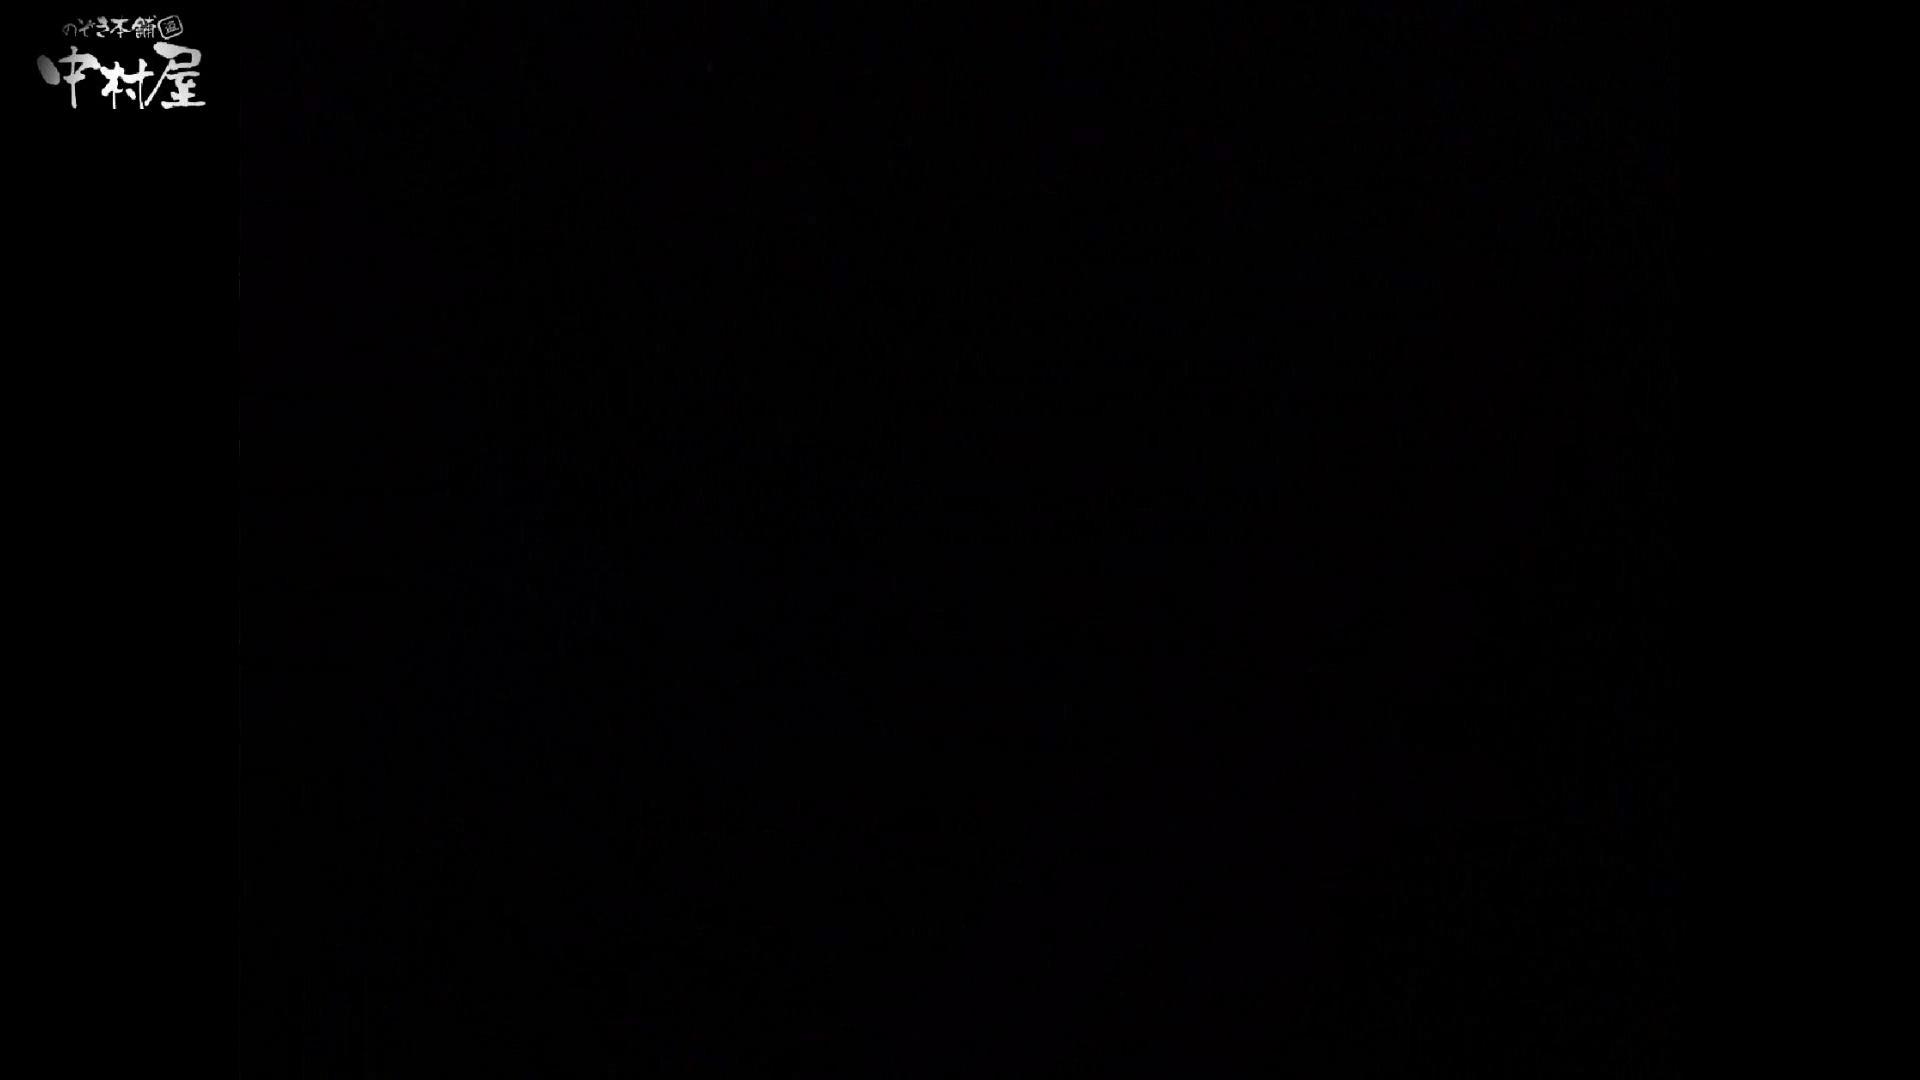 民家風呂専門盗撮師の超危険映像 vol.018 美少女のエロ生活  97連発 96